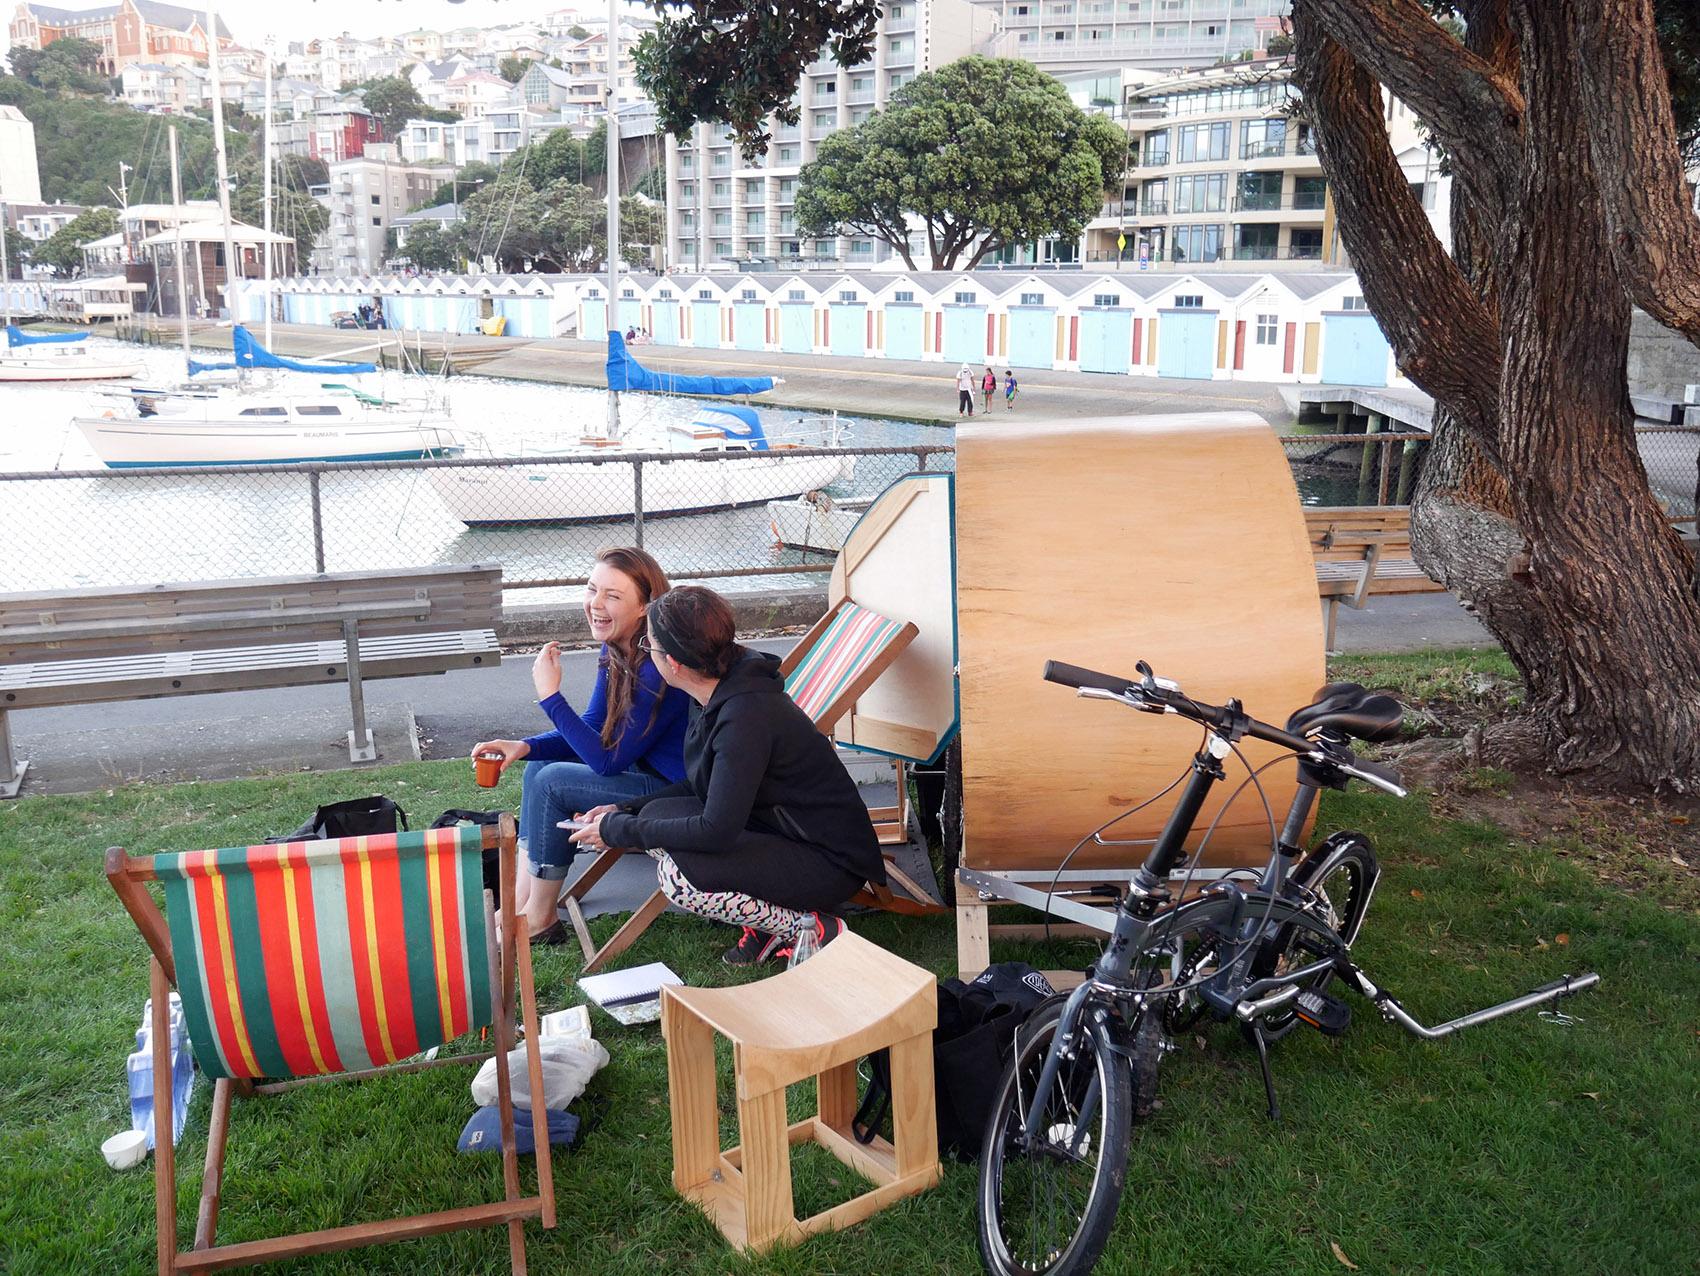 Caravan on grass by marina in Wellington